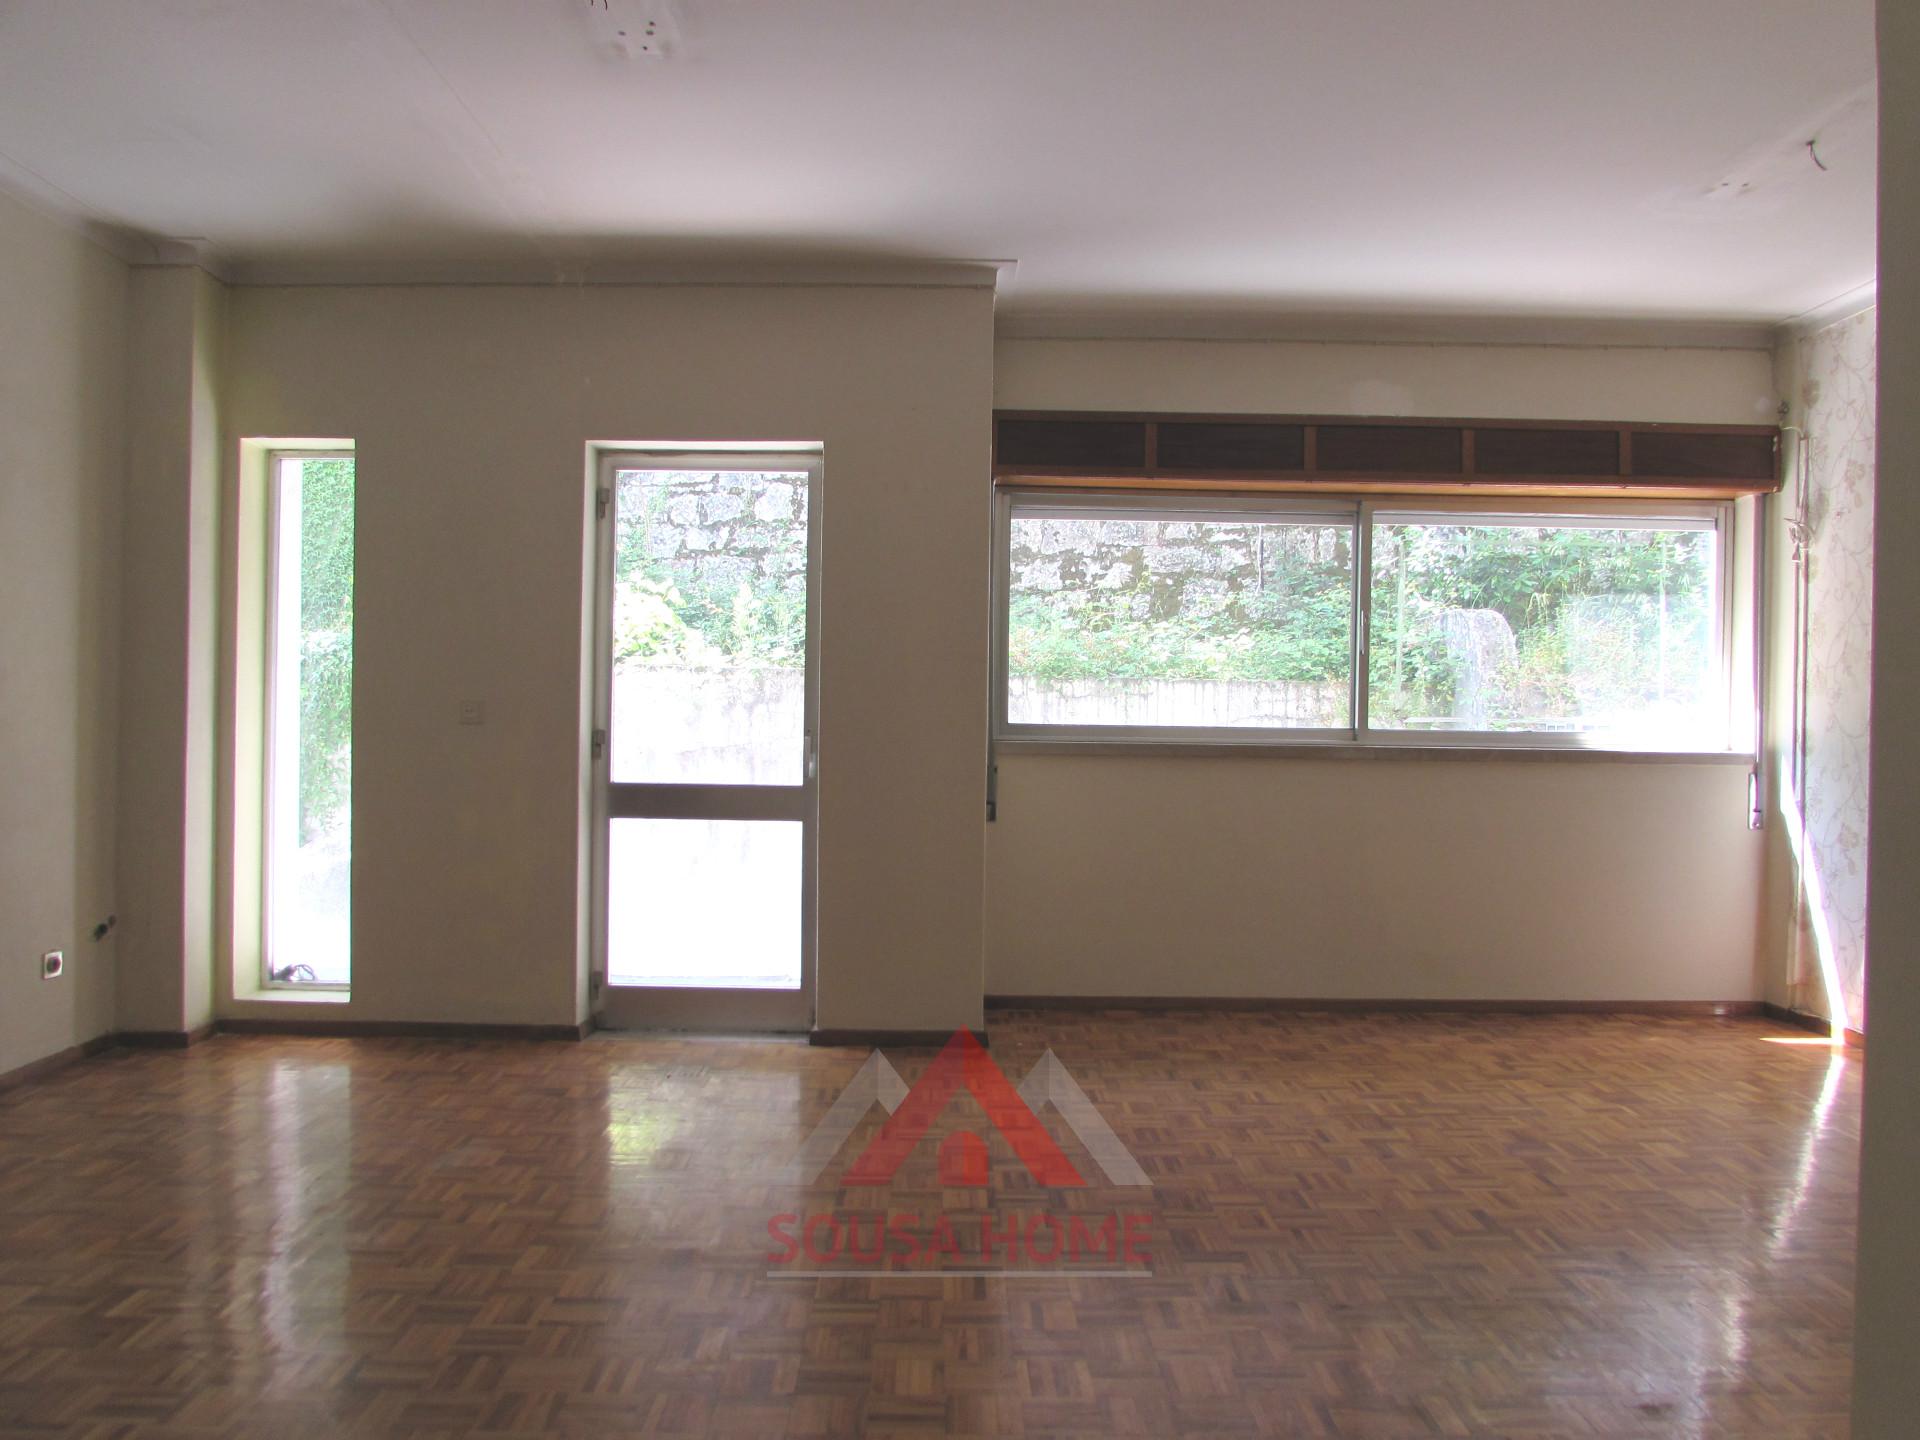 Escritório centro - 2 gabinetes + sala + terraço